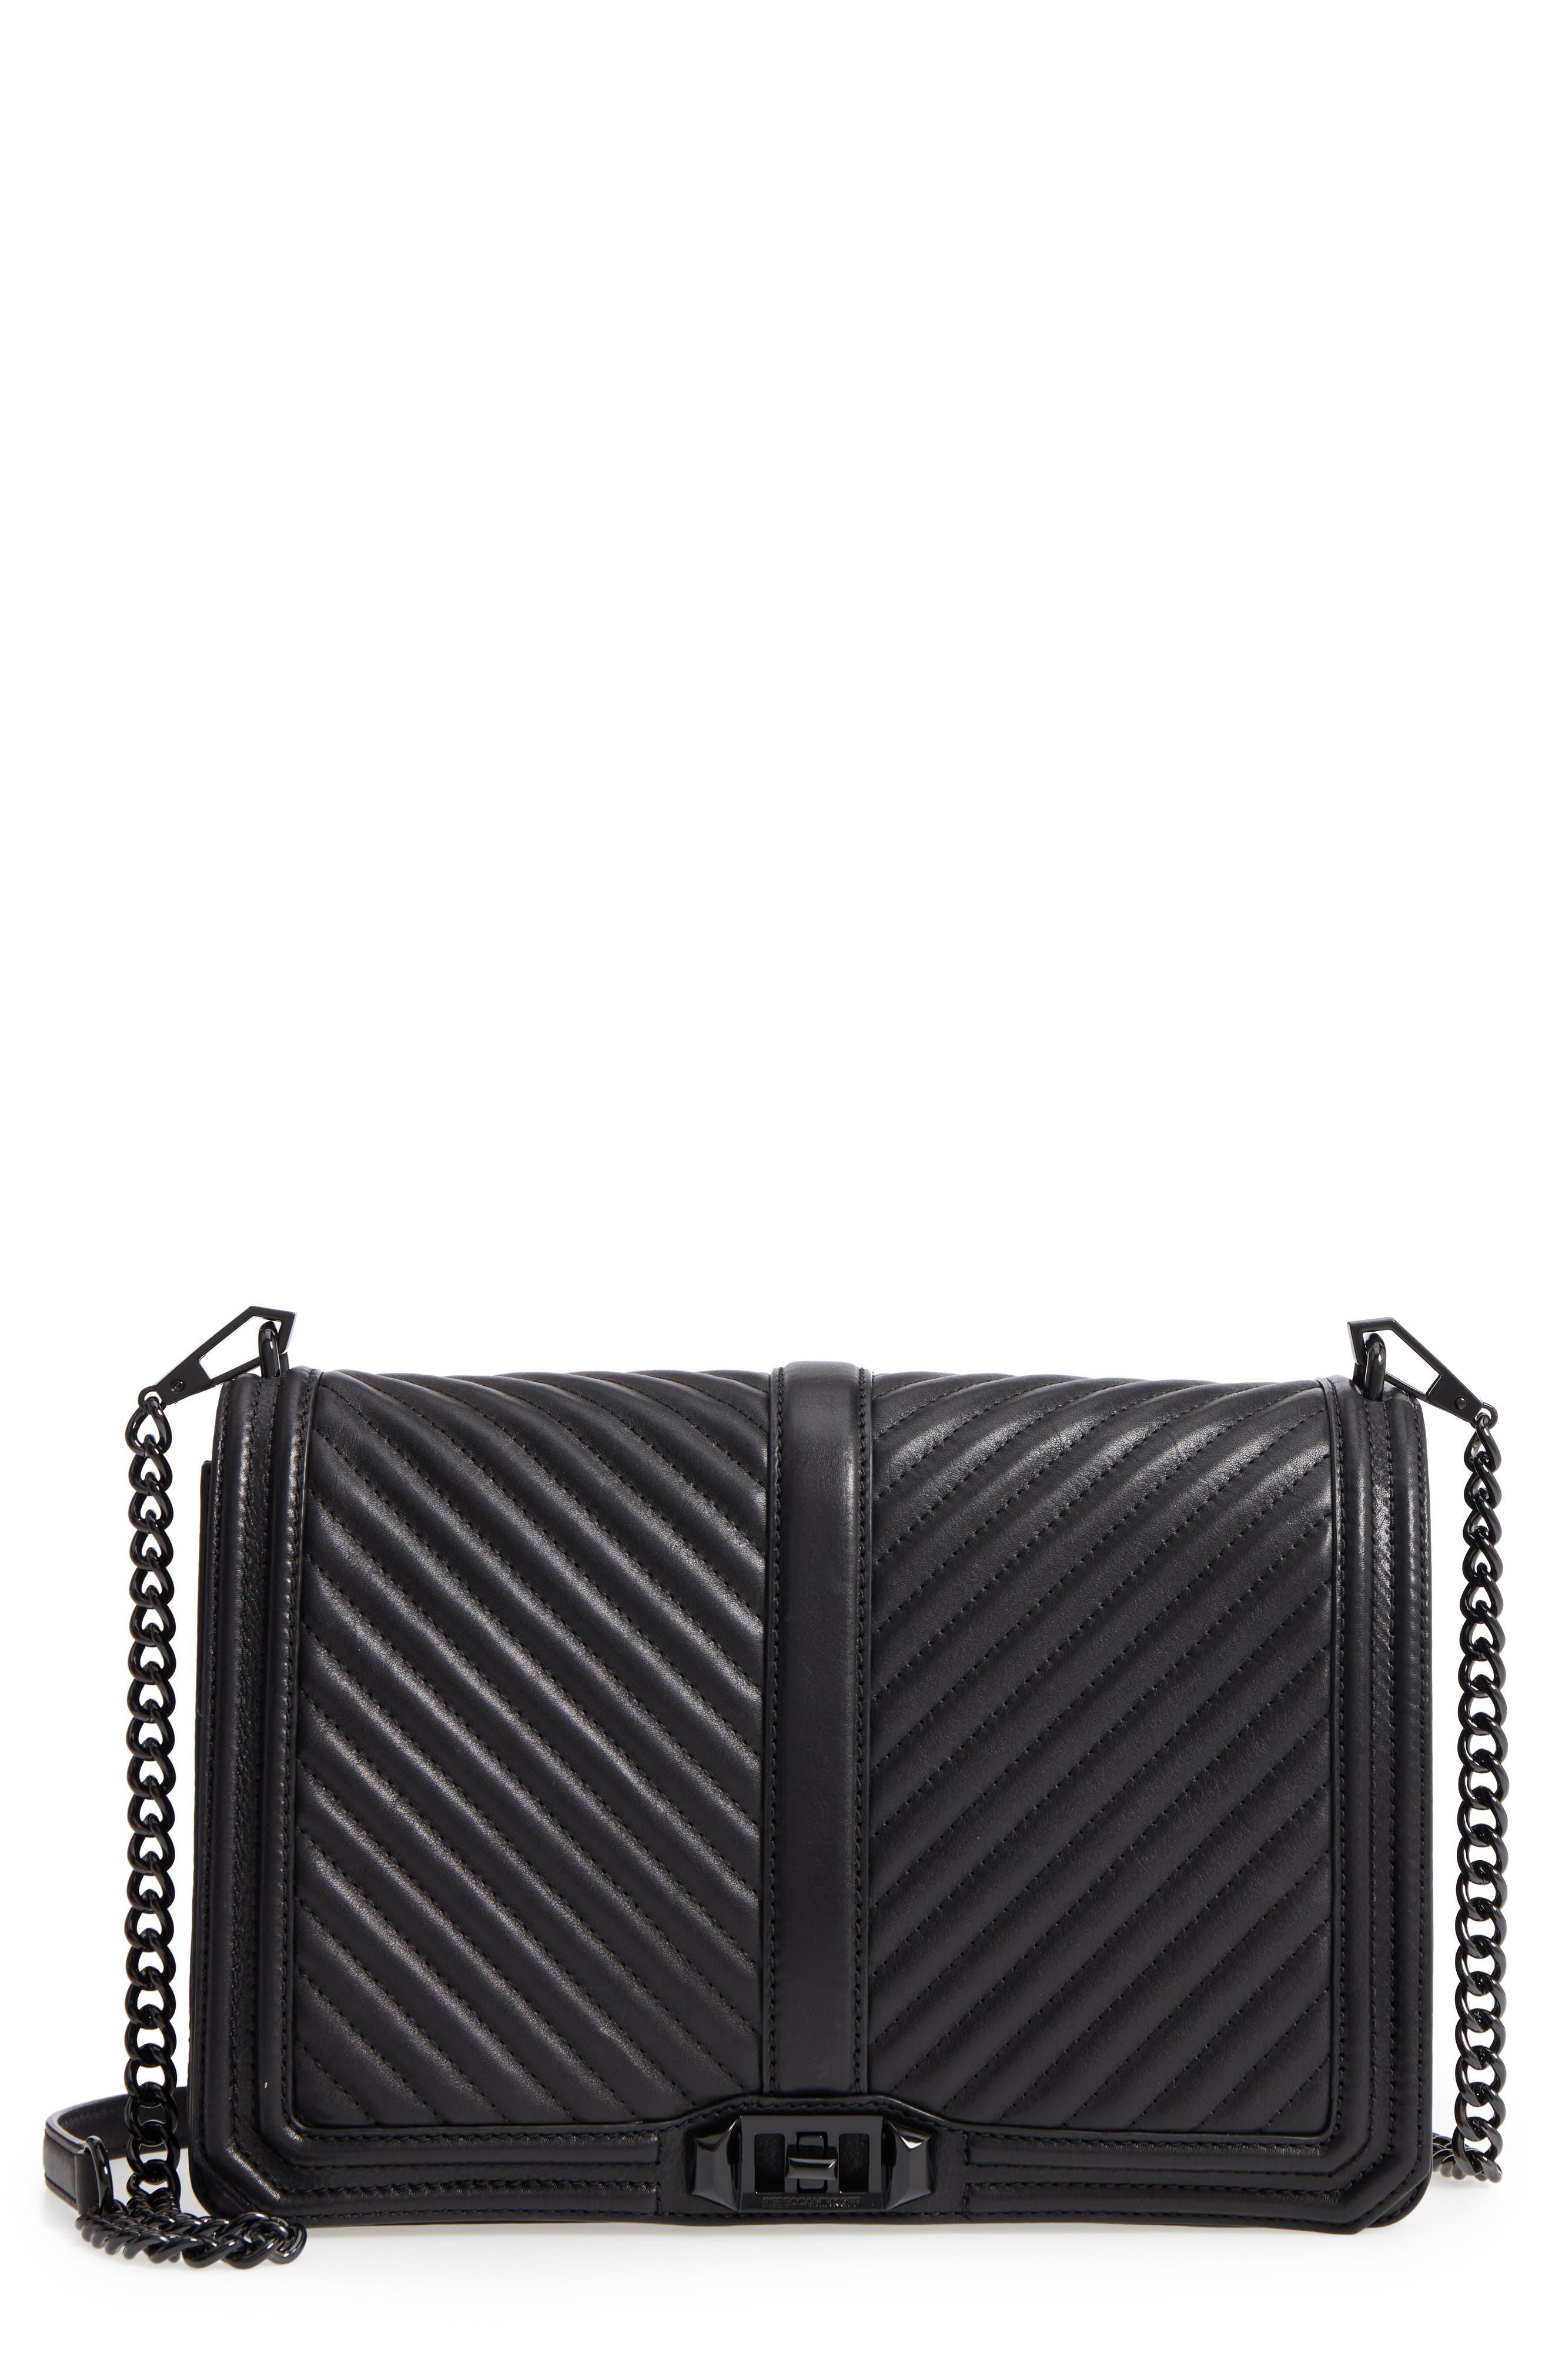 REBECCA MINKOFF 'Love Jumbo' Crossbody Bag, Main, color, JET BLACK